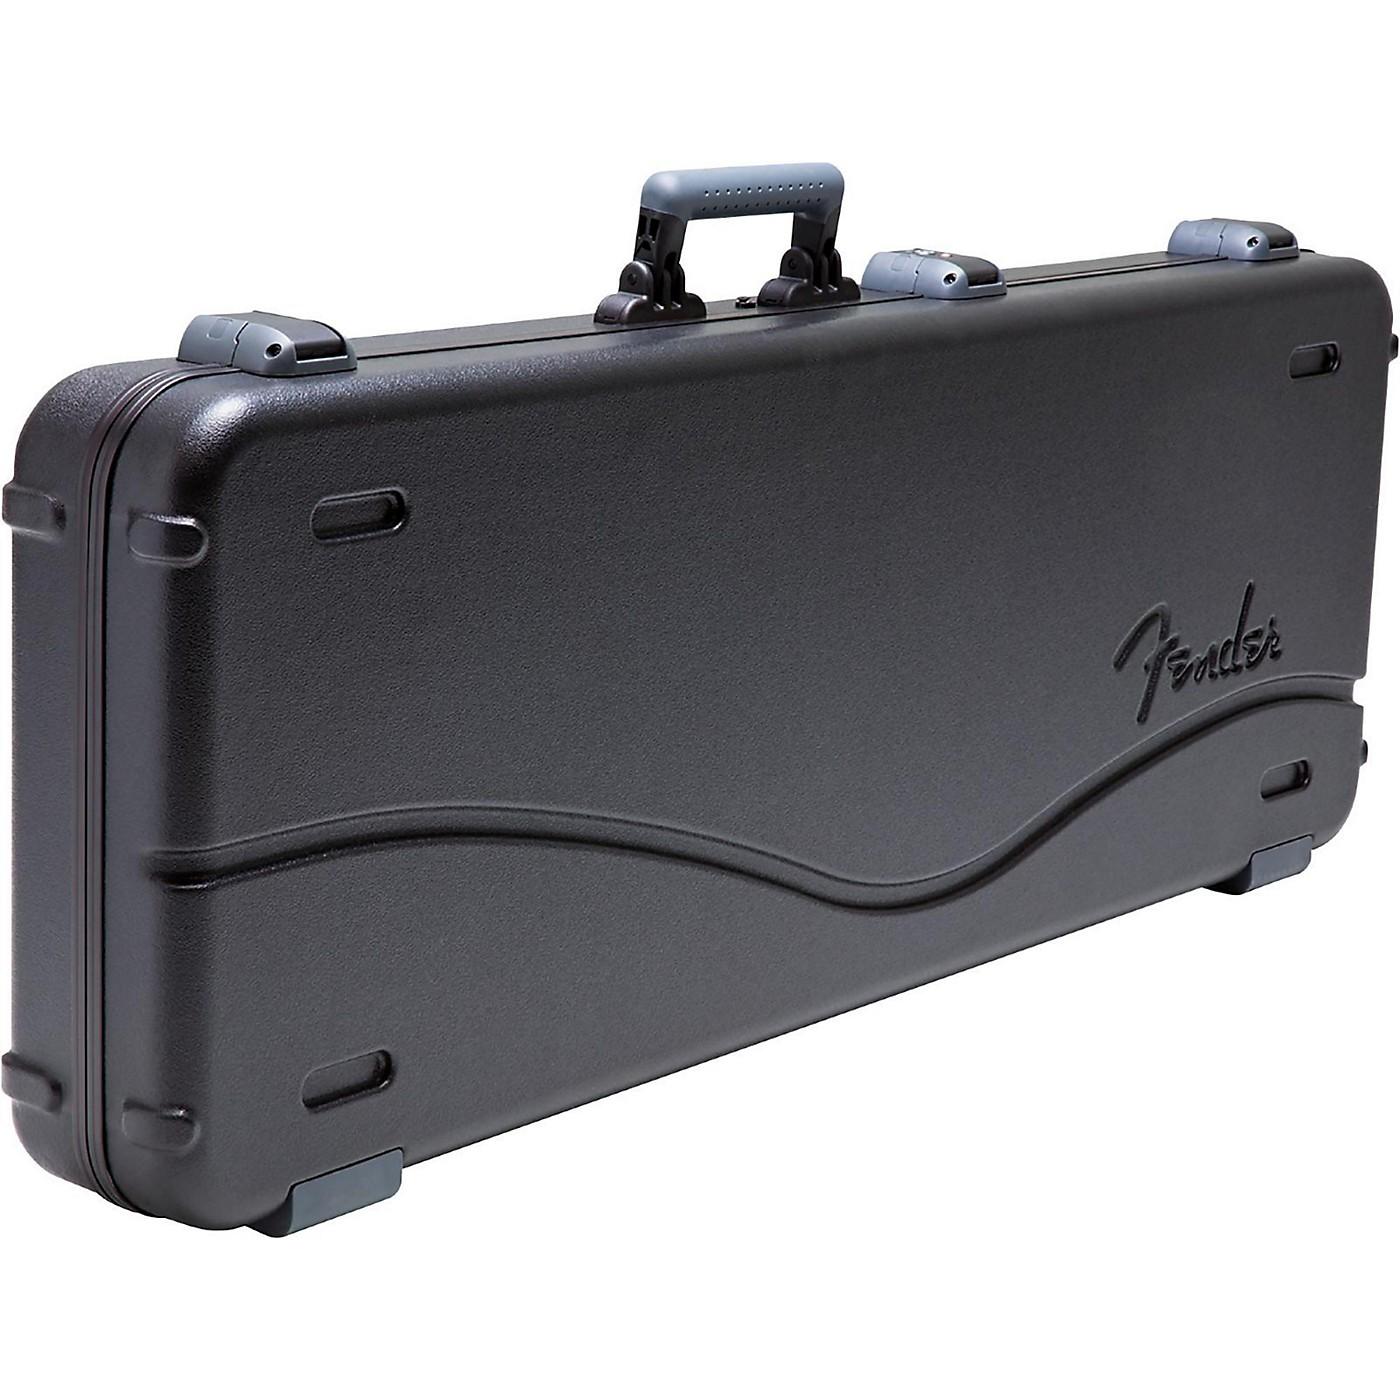 Fender Deluxe Molded ABS Jaguar/Jazzmaster Guitar Case thumbnail